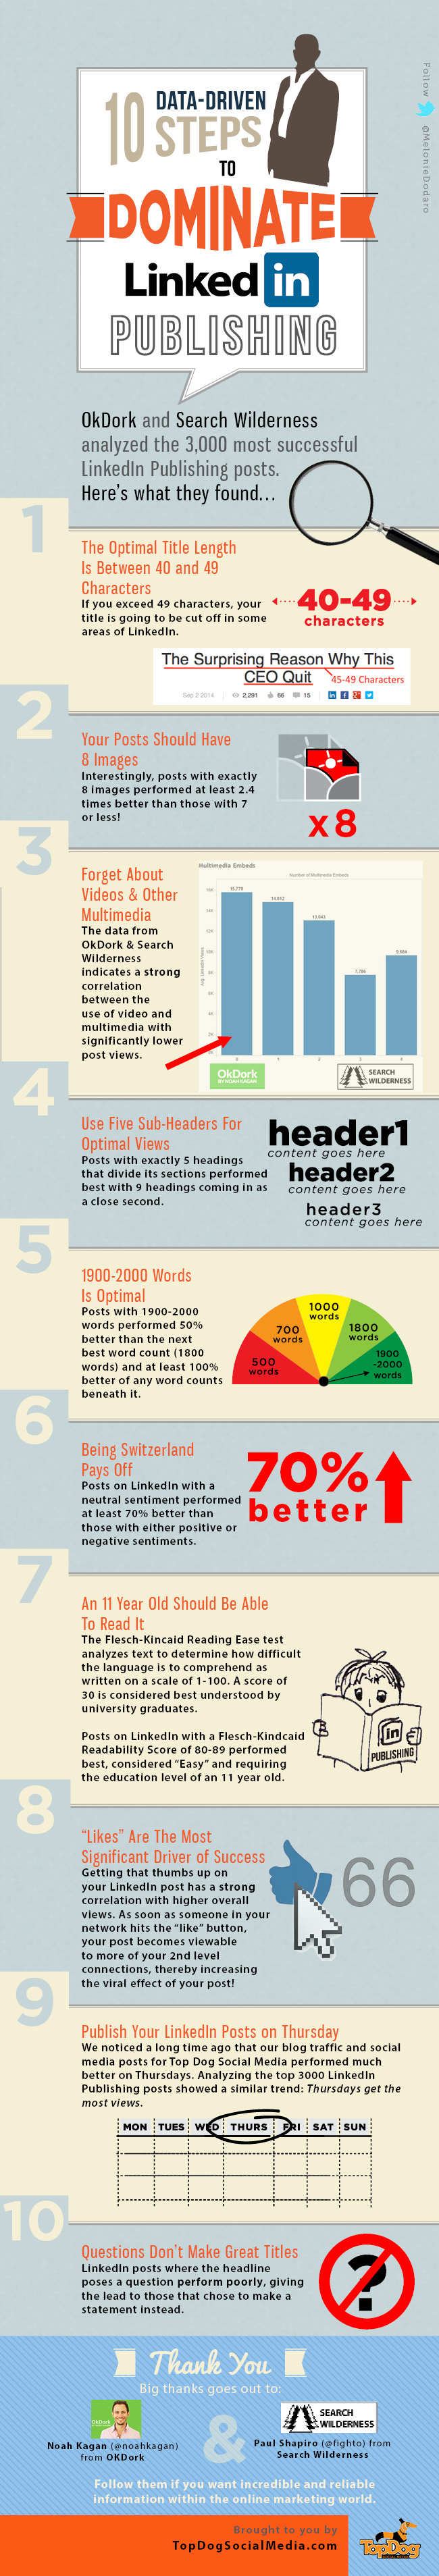 10 steps-to-dominate-LinkedIn-publishing